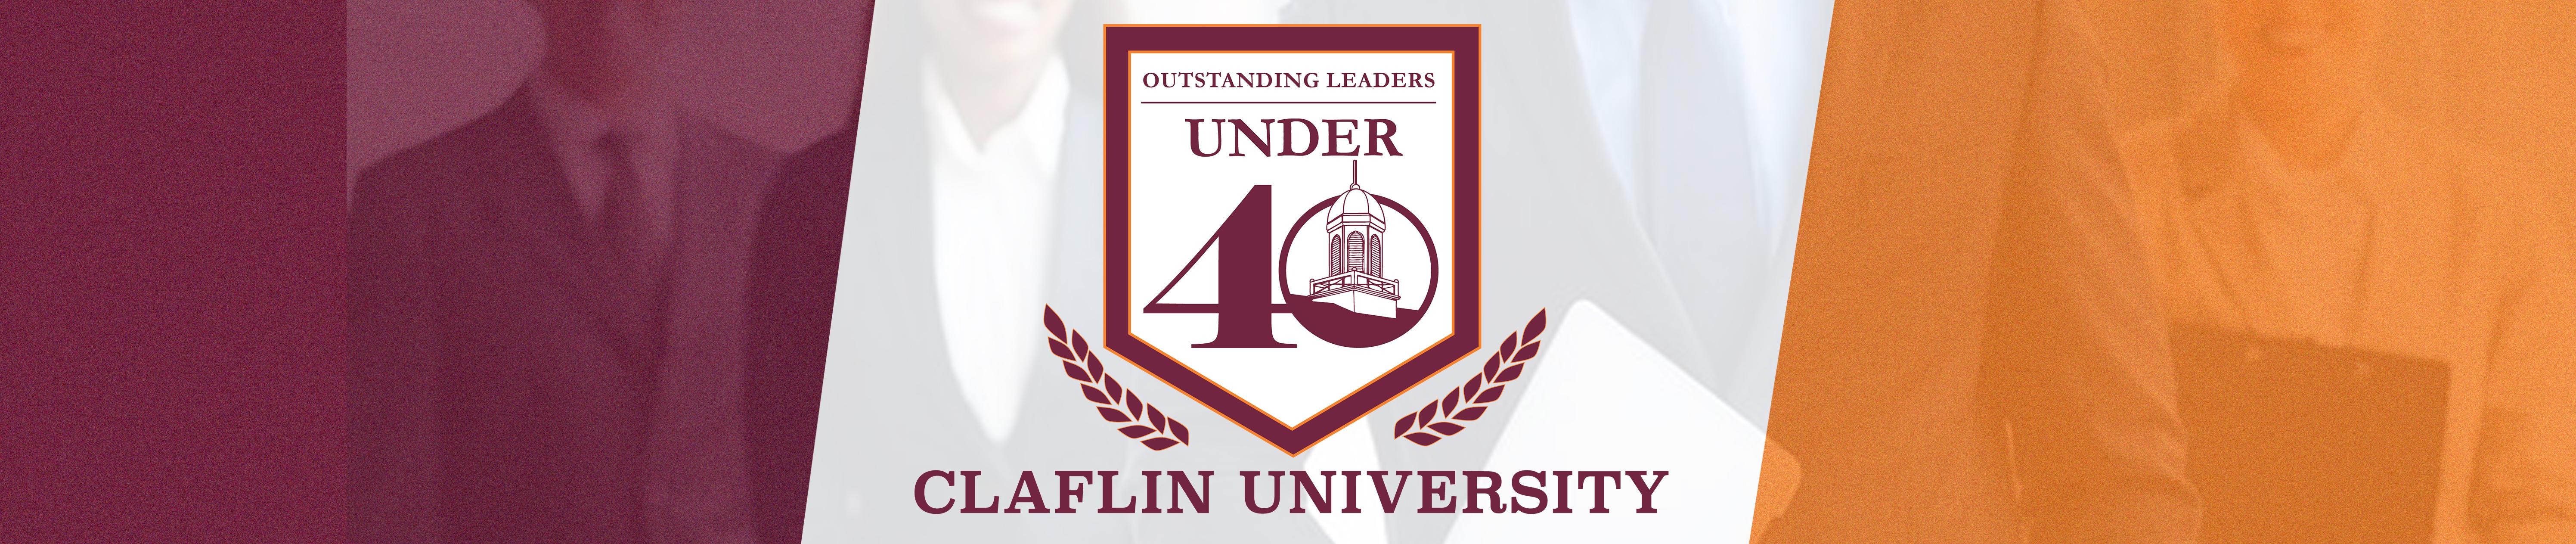 Outstanding Leaders Under 40 banner